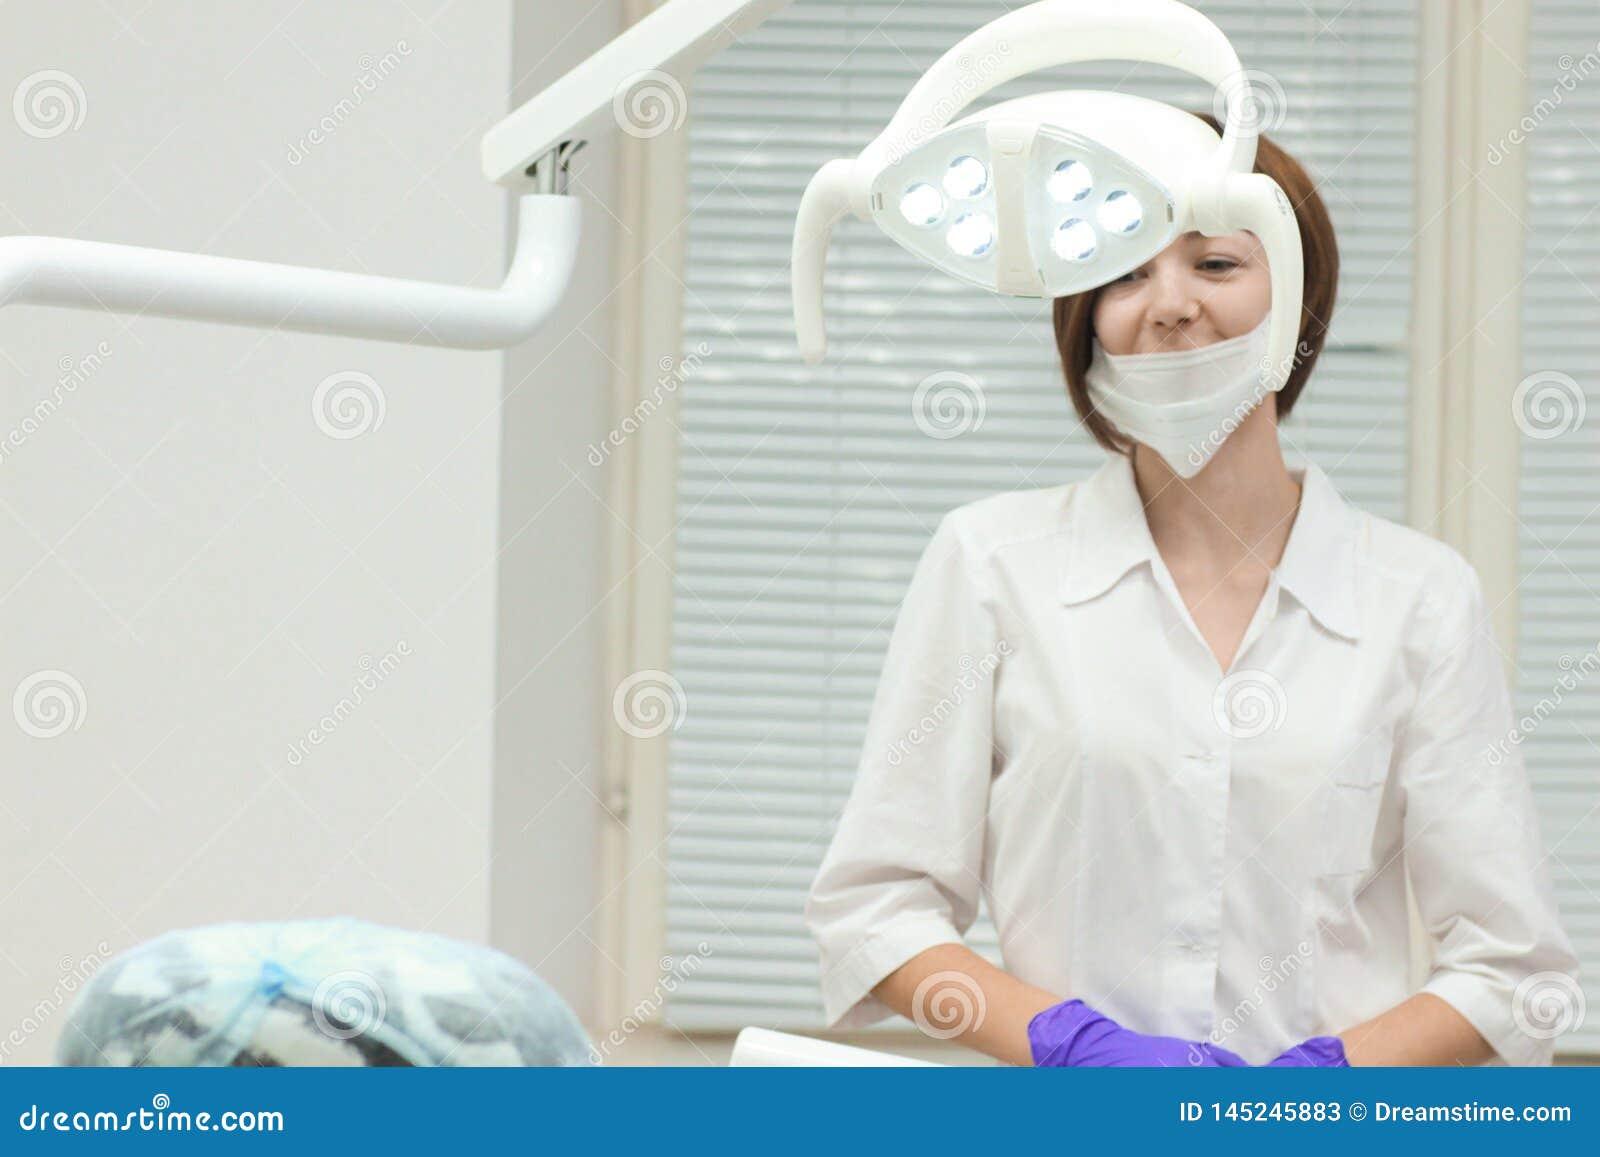 ?e?ski dentysta czeka? na pacjent